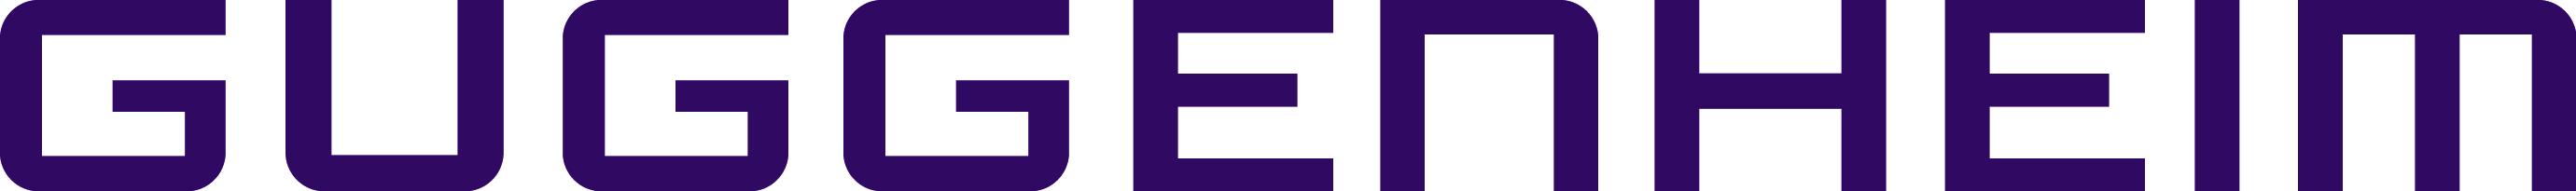 Guggenheim Credit Income Fund 2019 logo